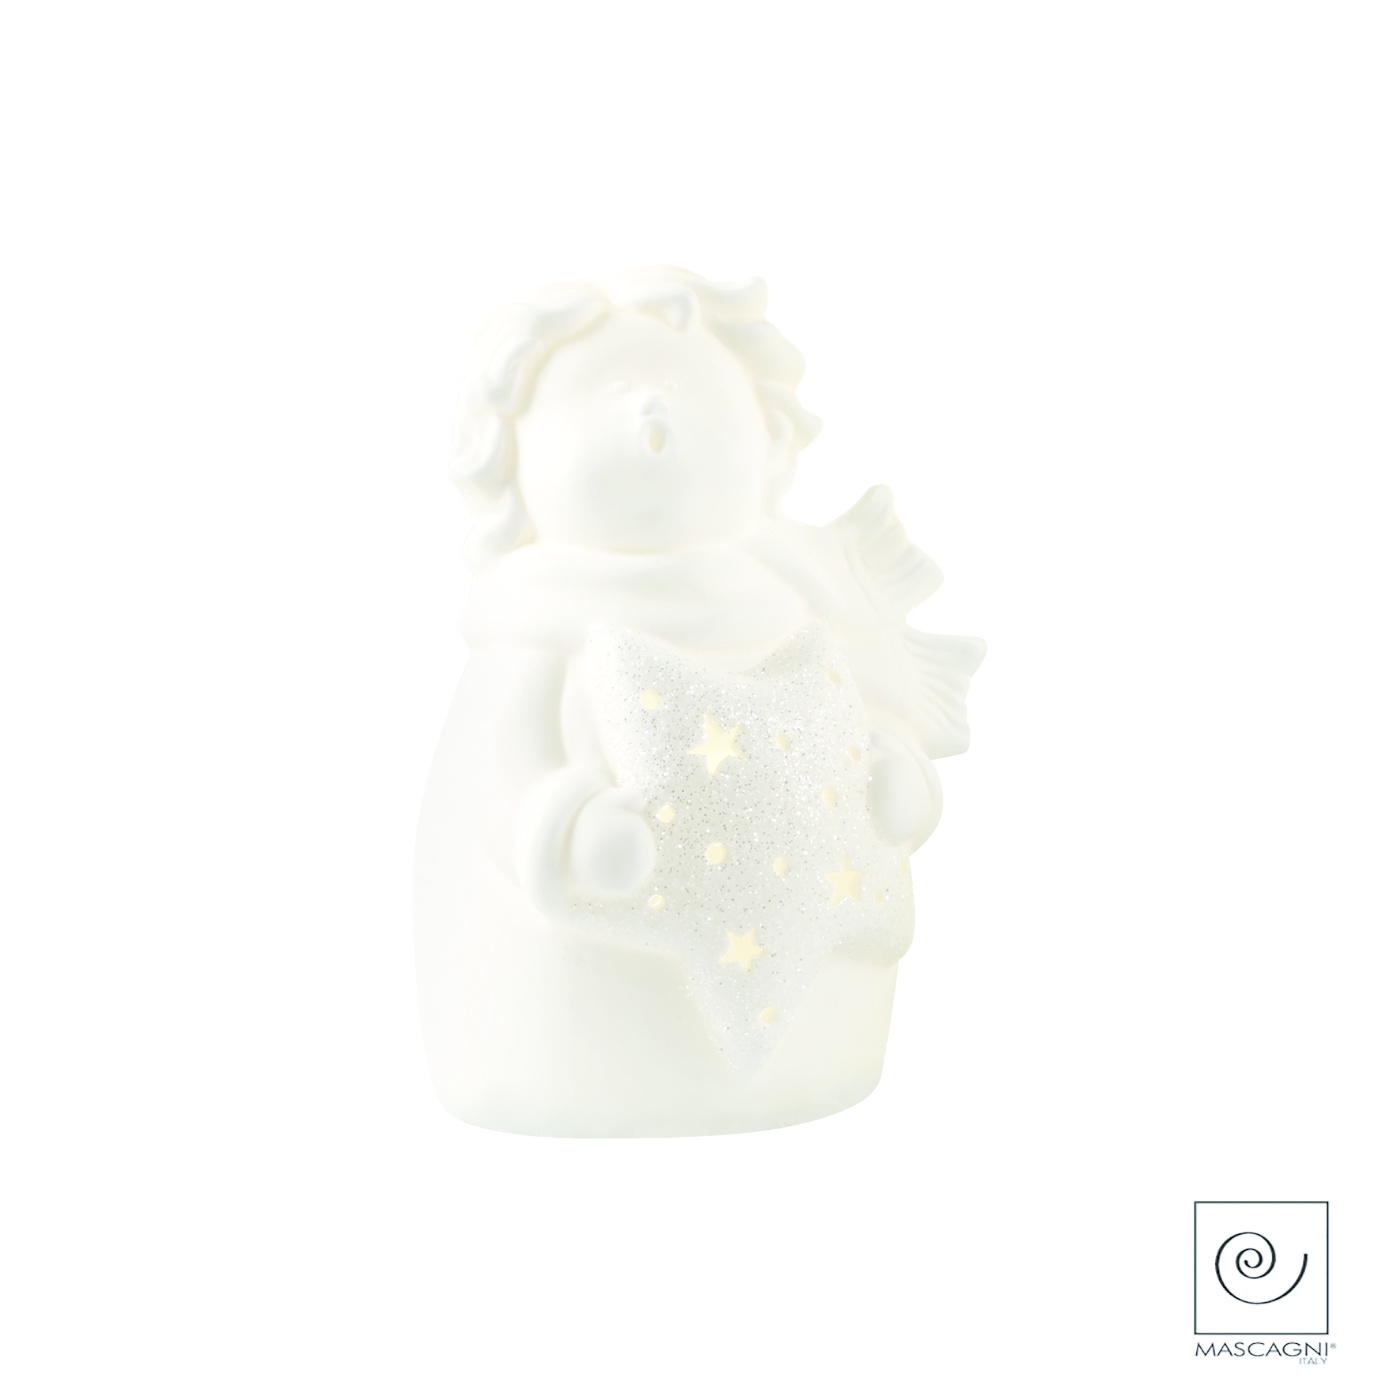 Art Mascagni LED ANGEL DECORATION CM.13